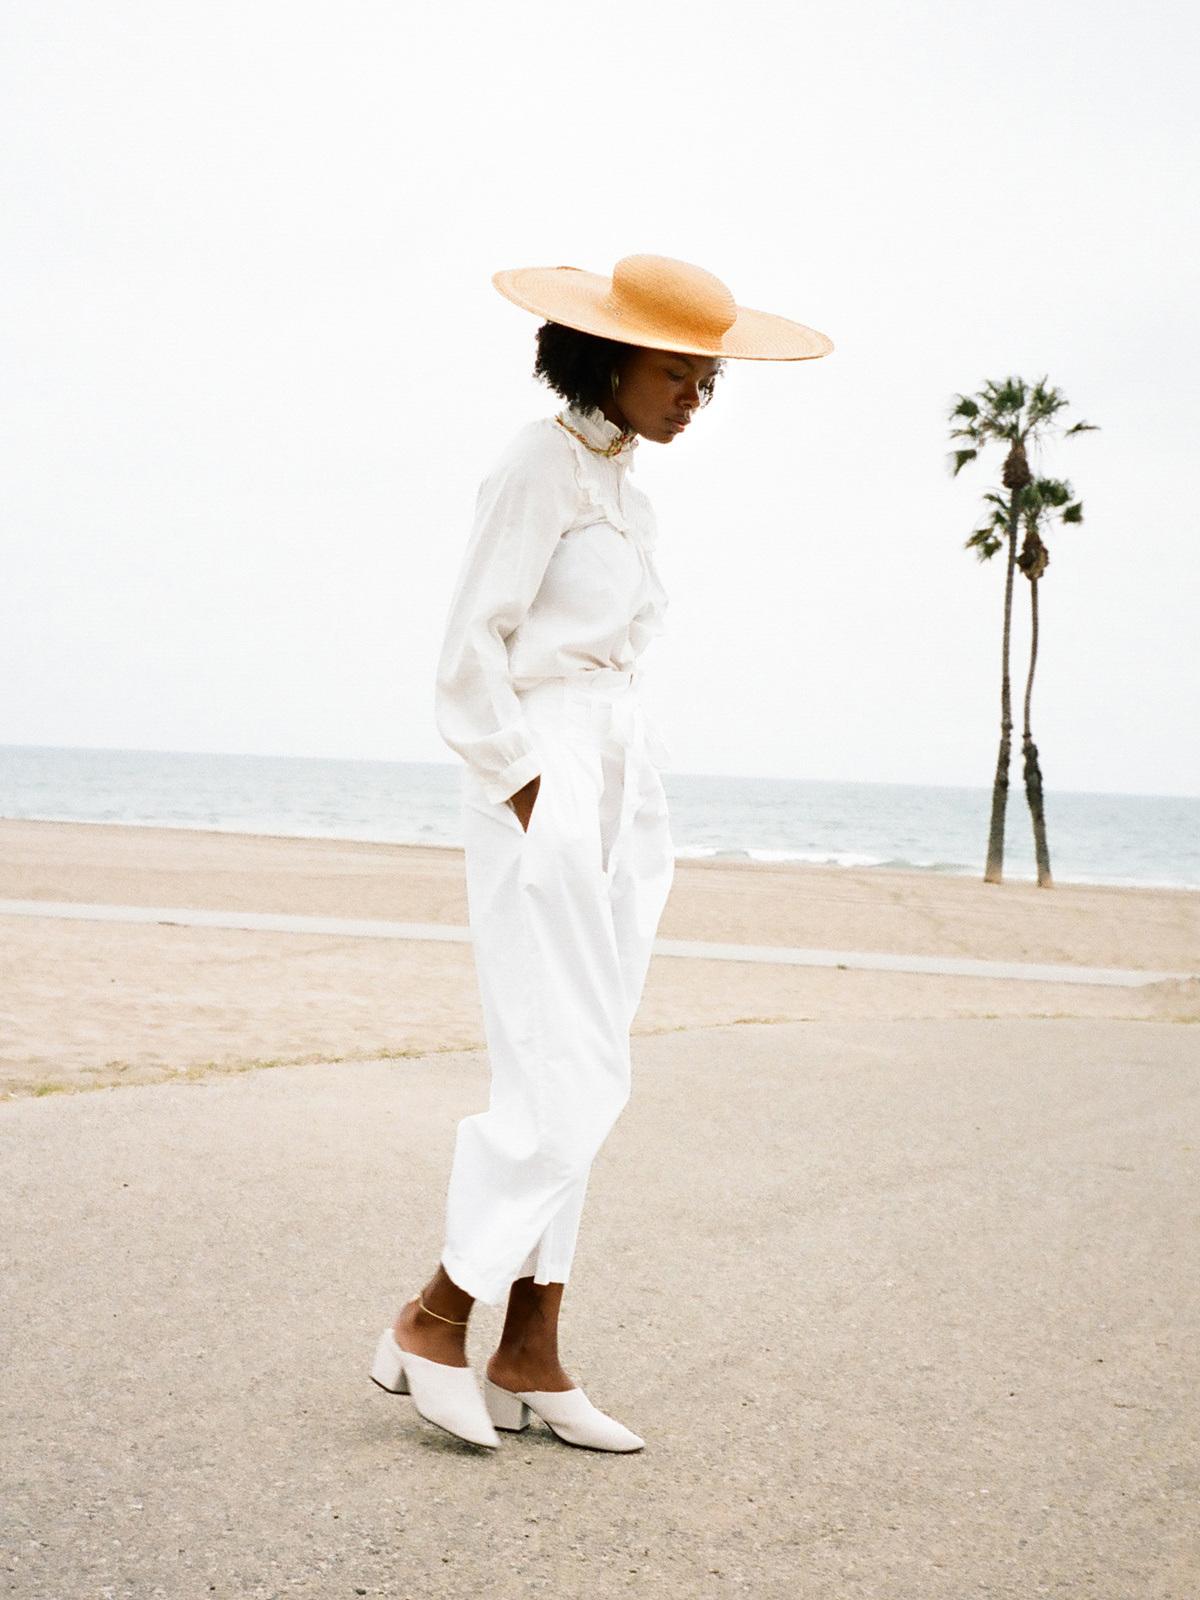 Los-Angeles-Fashion-Photographer-09